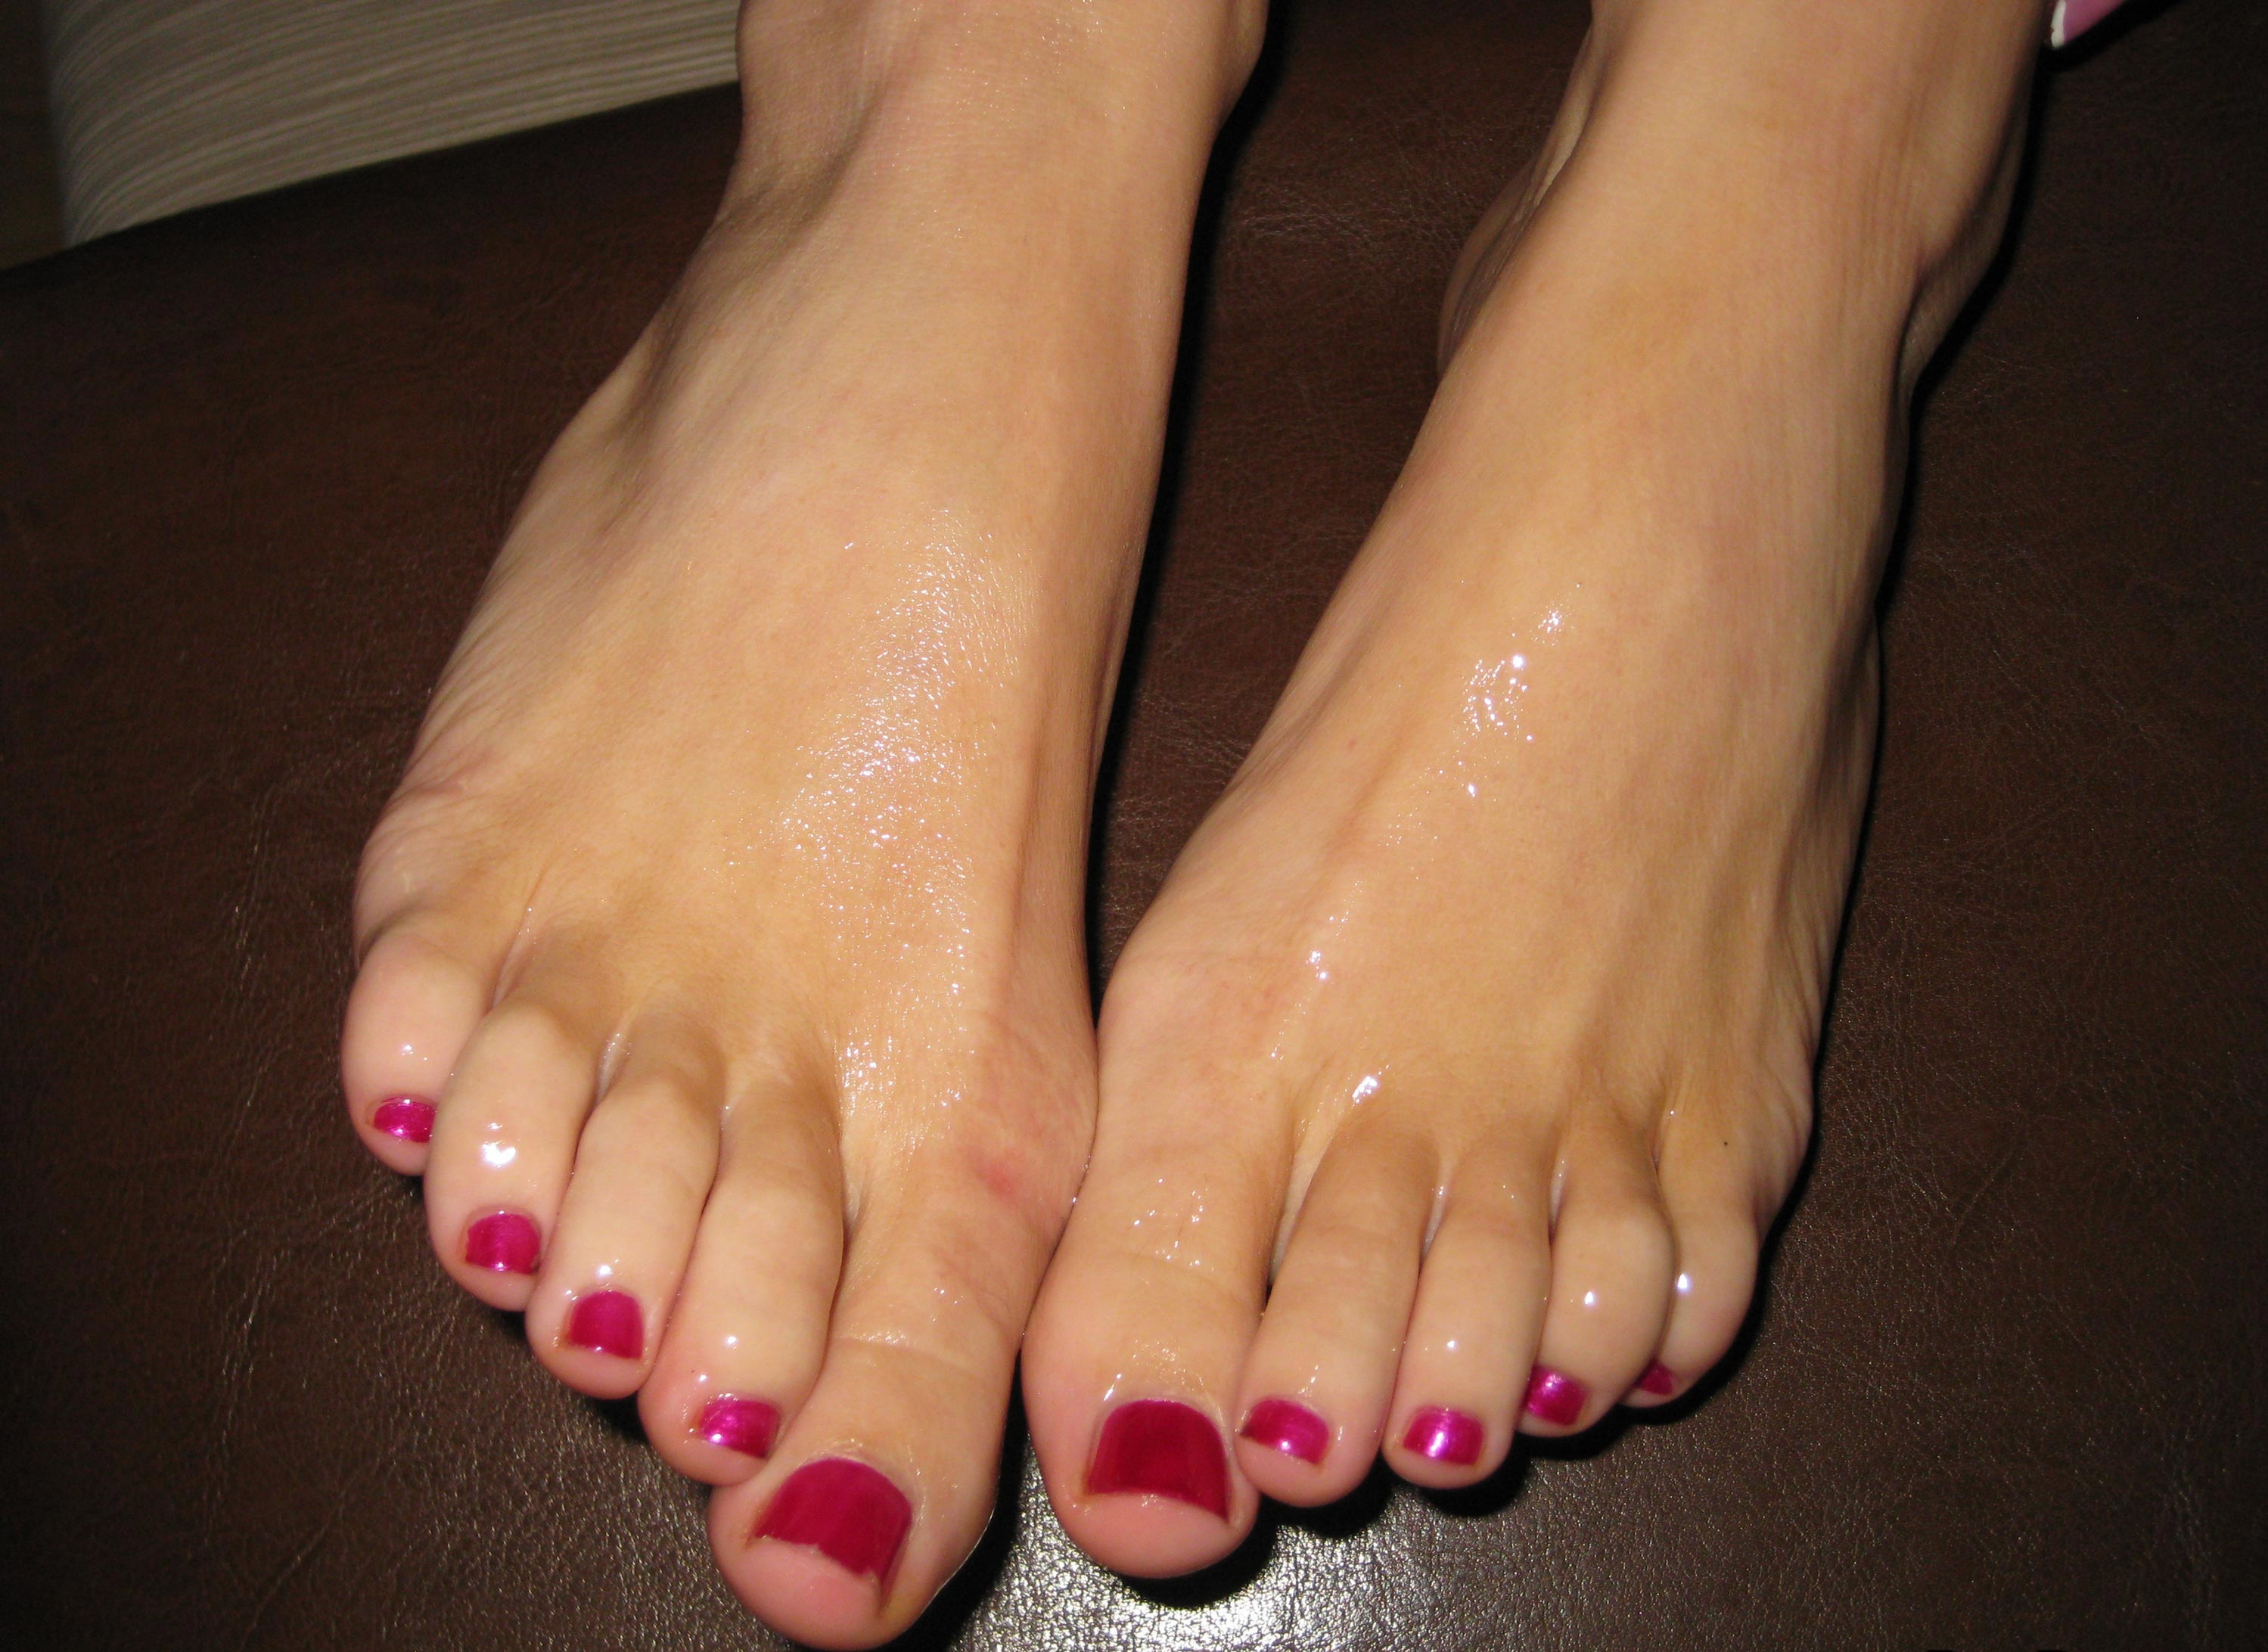 brandi edwards feet